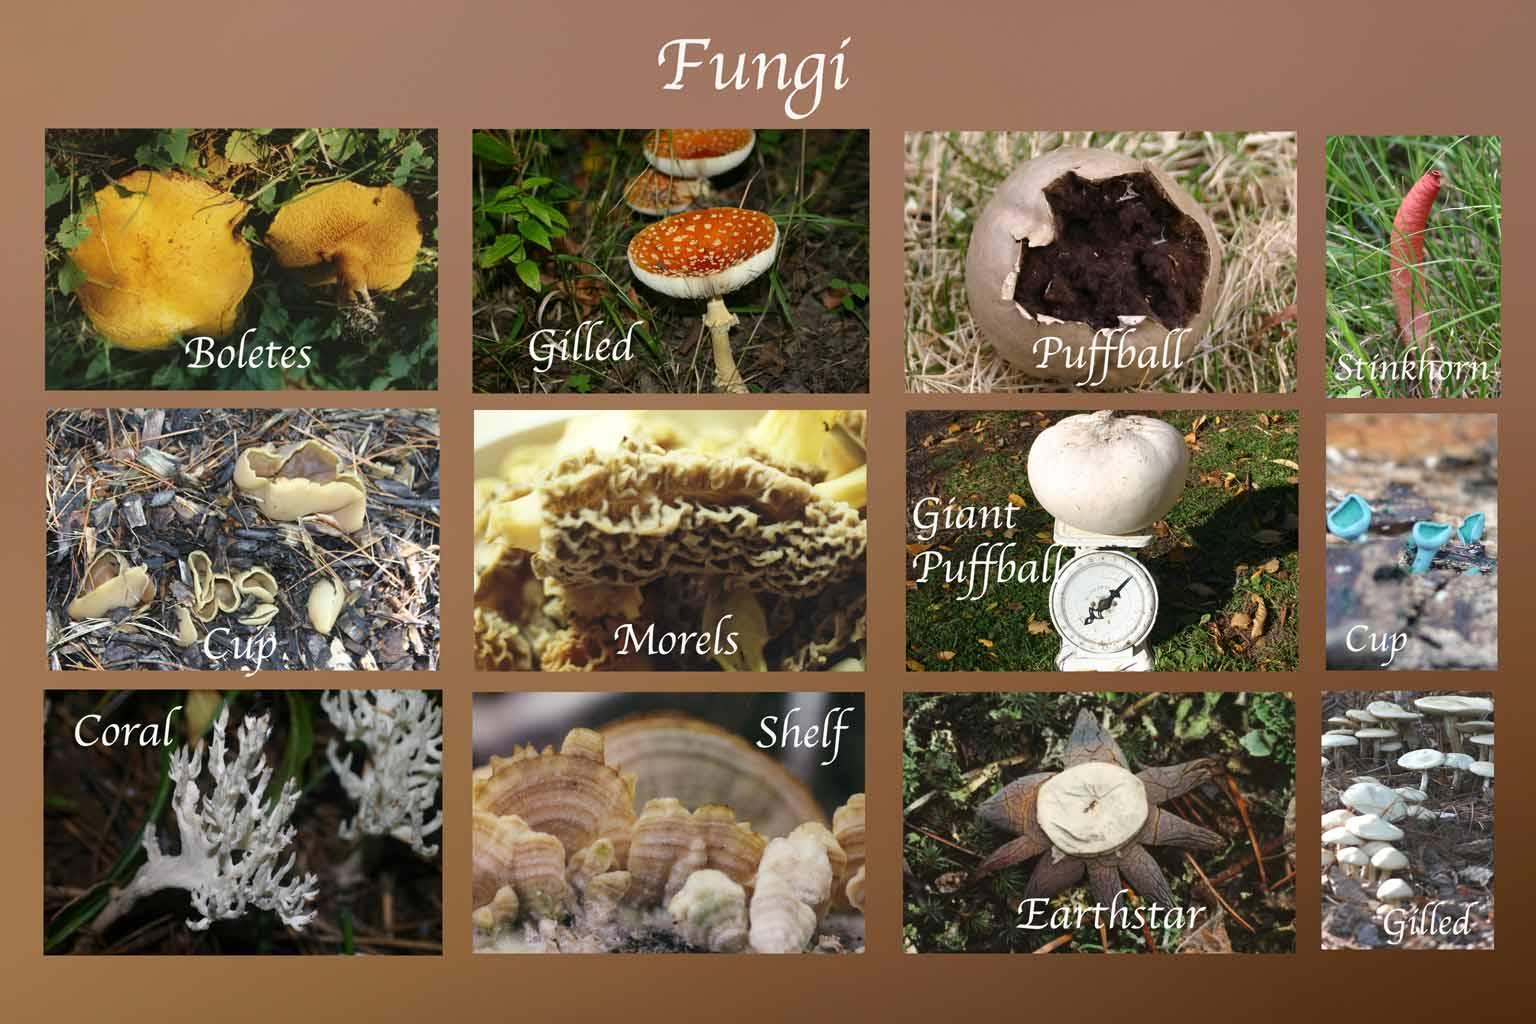 http://www.kusemuseum-naturepreserve.org/Plants/PlantsOther/Fungi.htm